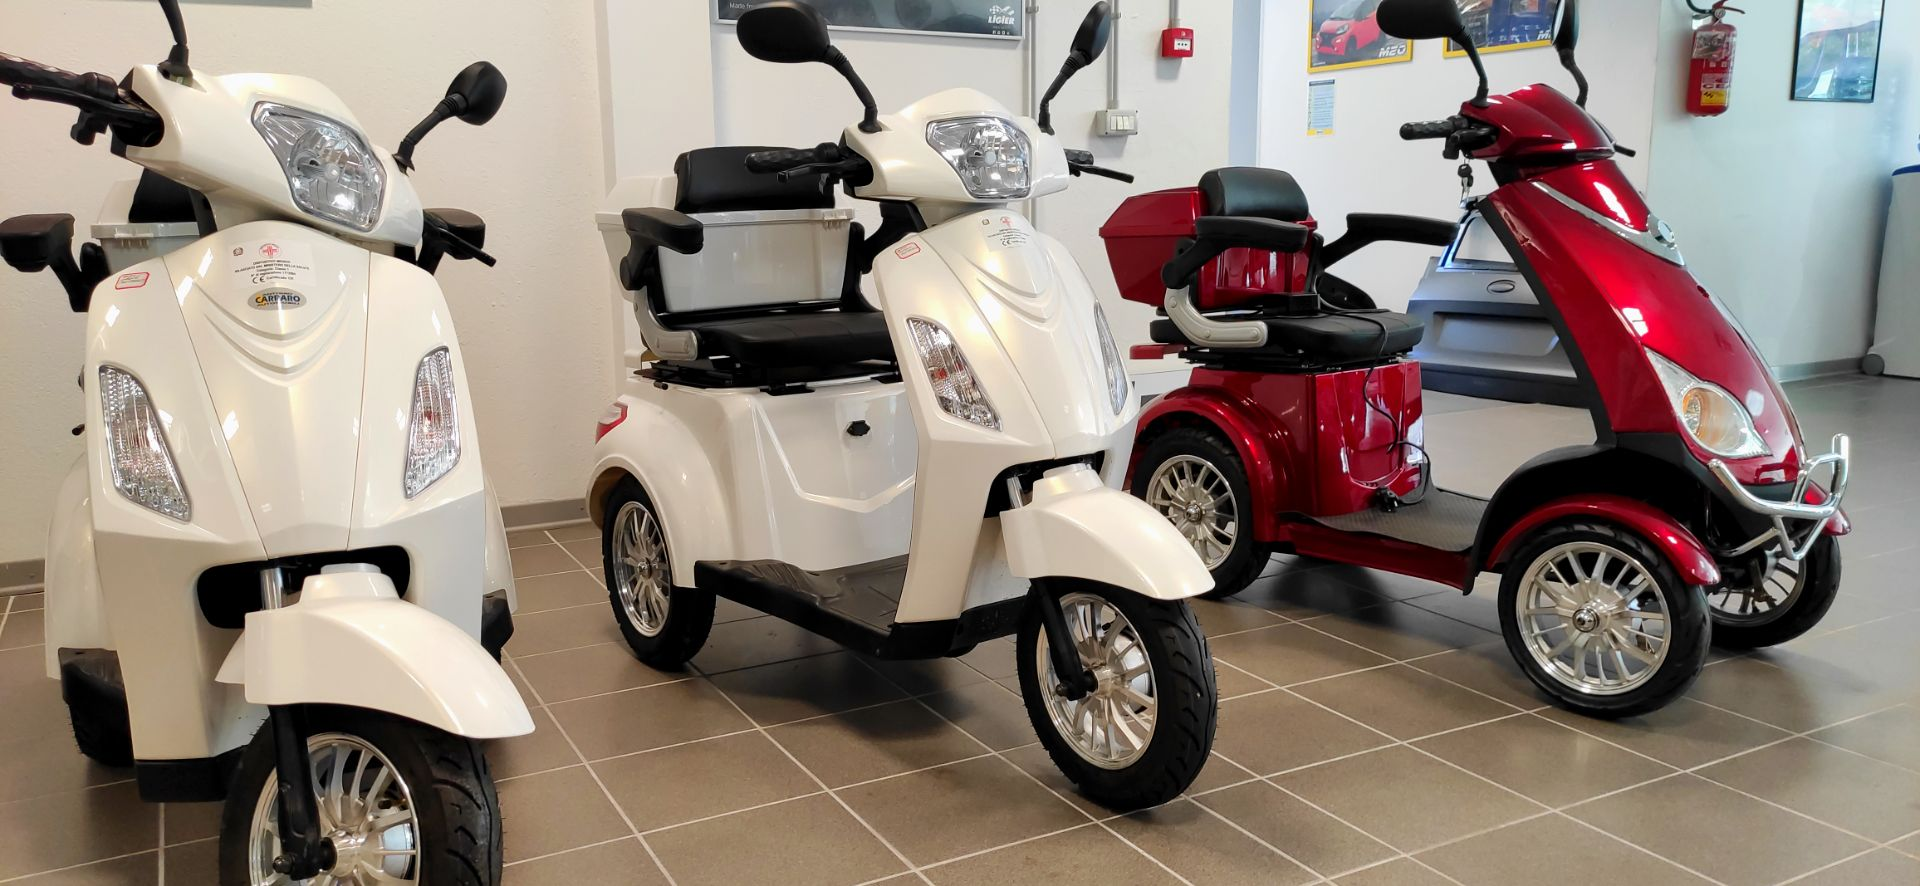 scooter-anziani-senza-patente